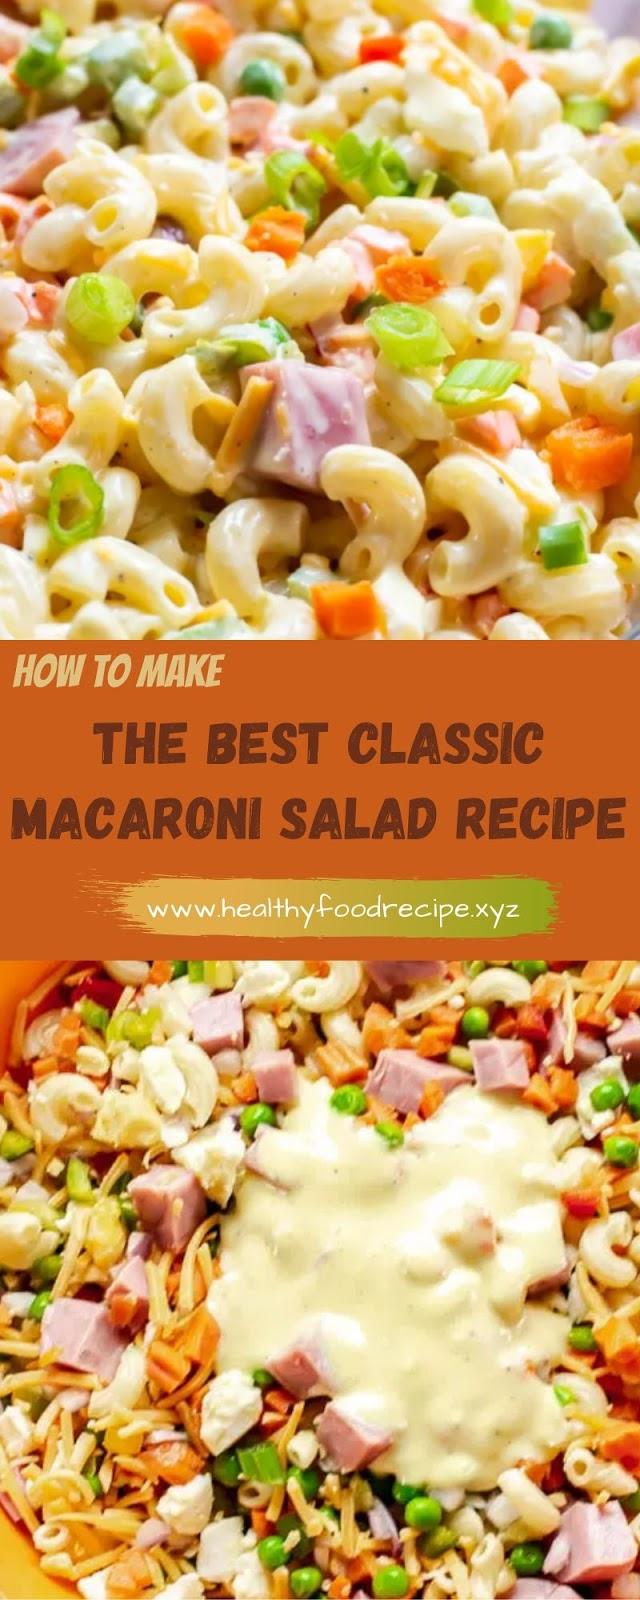 THE BEST CLASSIC MACARONI SALAD RECIPE